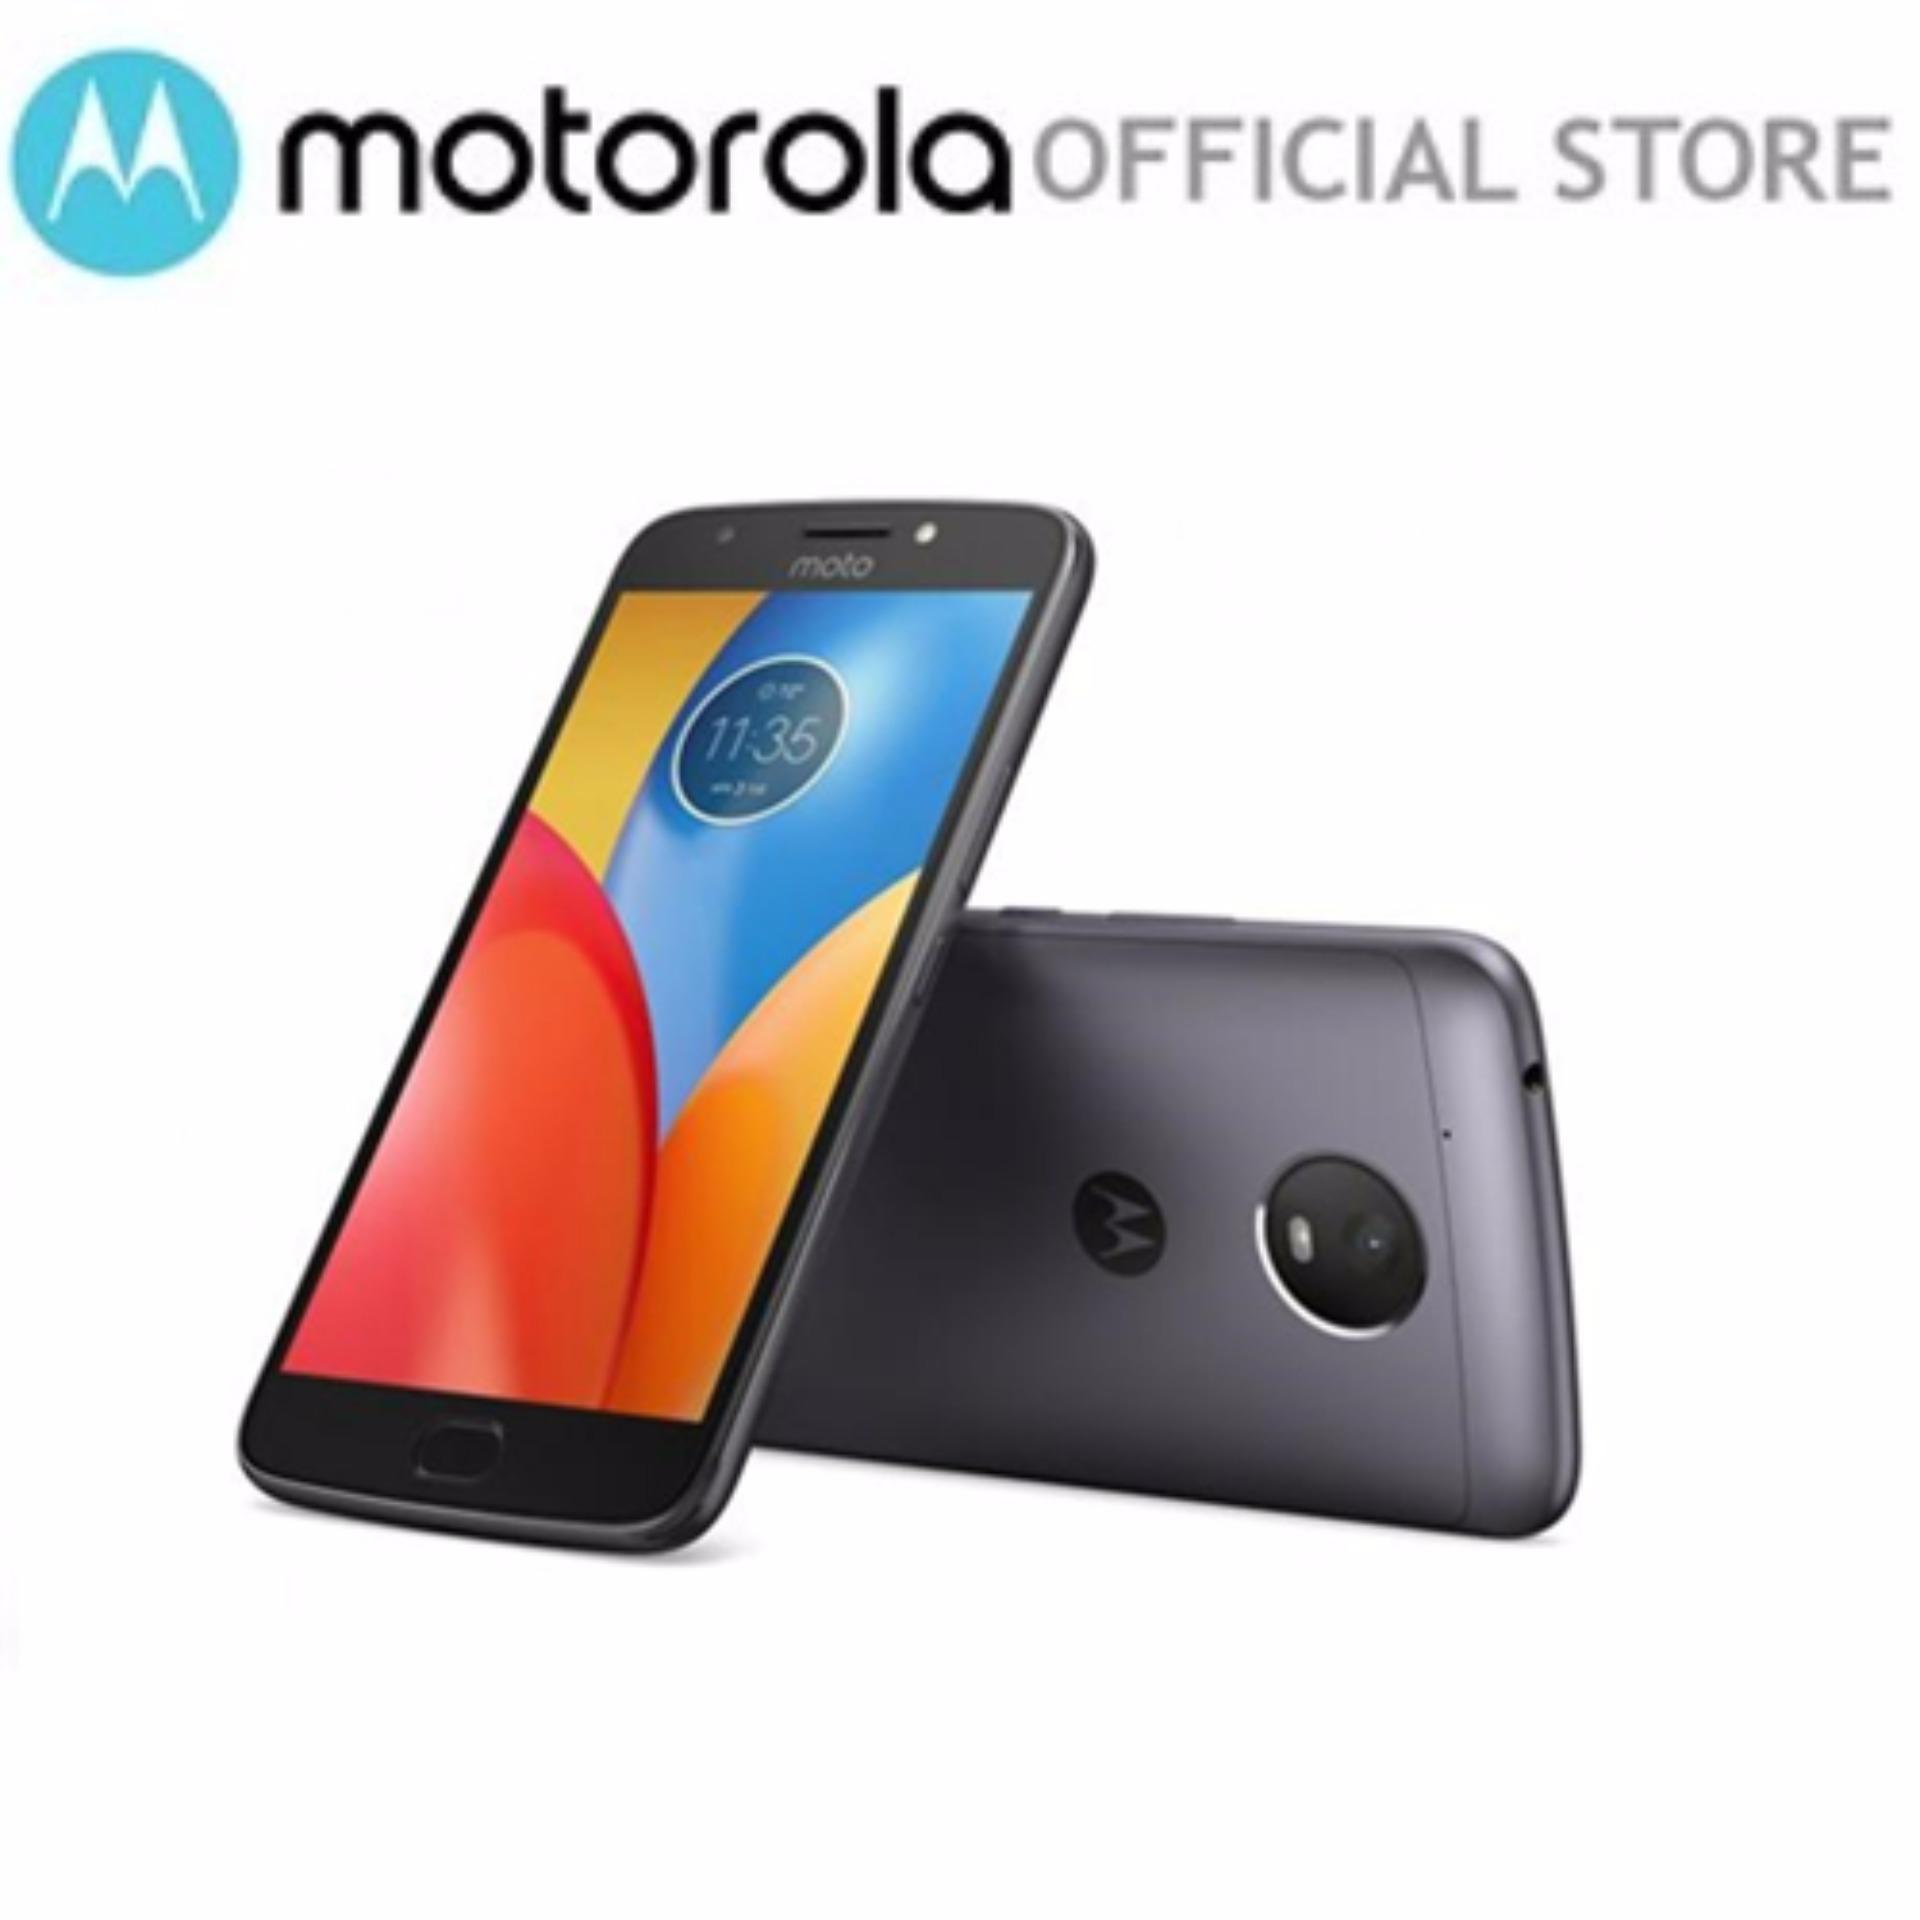 Motorola Moto E4 Plus 3G+32GB XT1770 Iron Grey 1 year local warranty